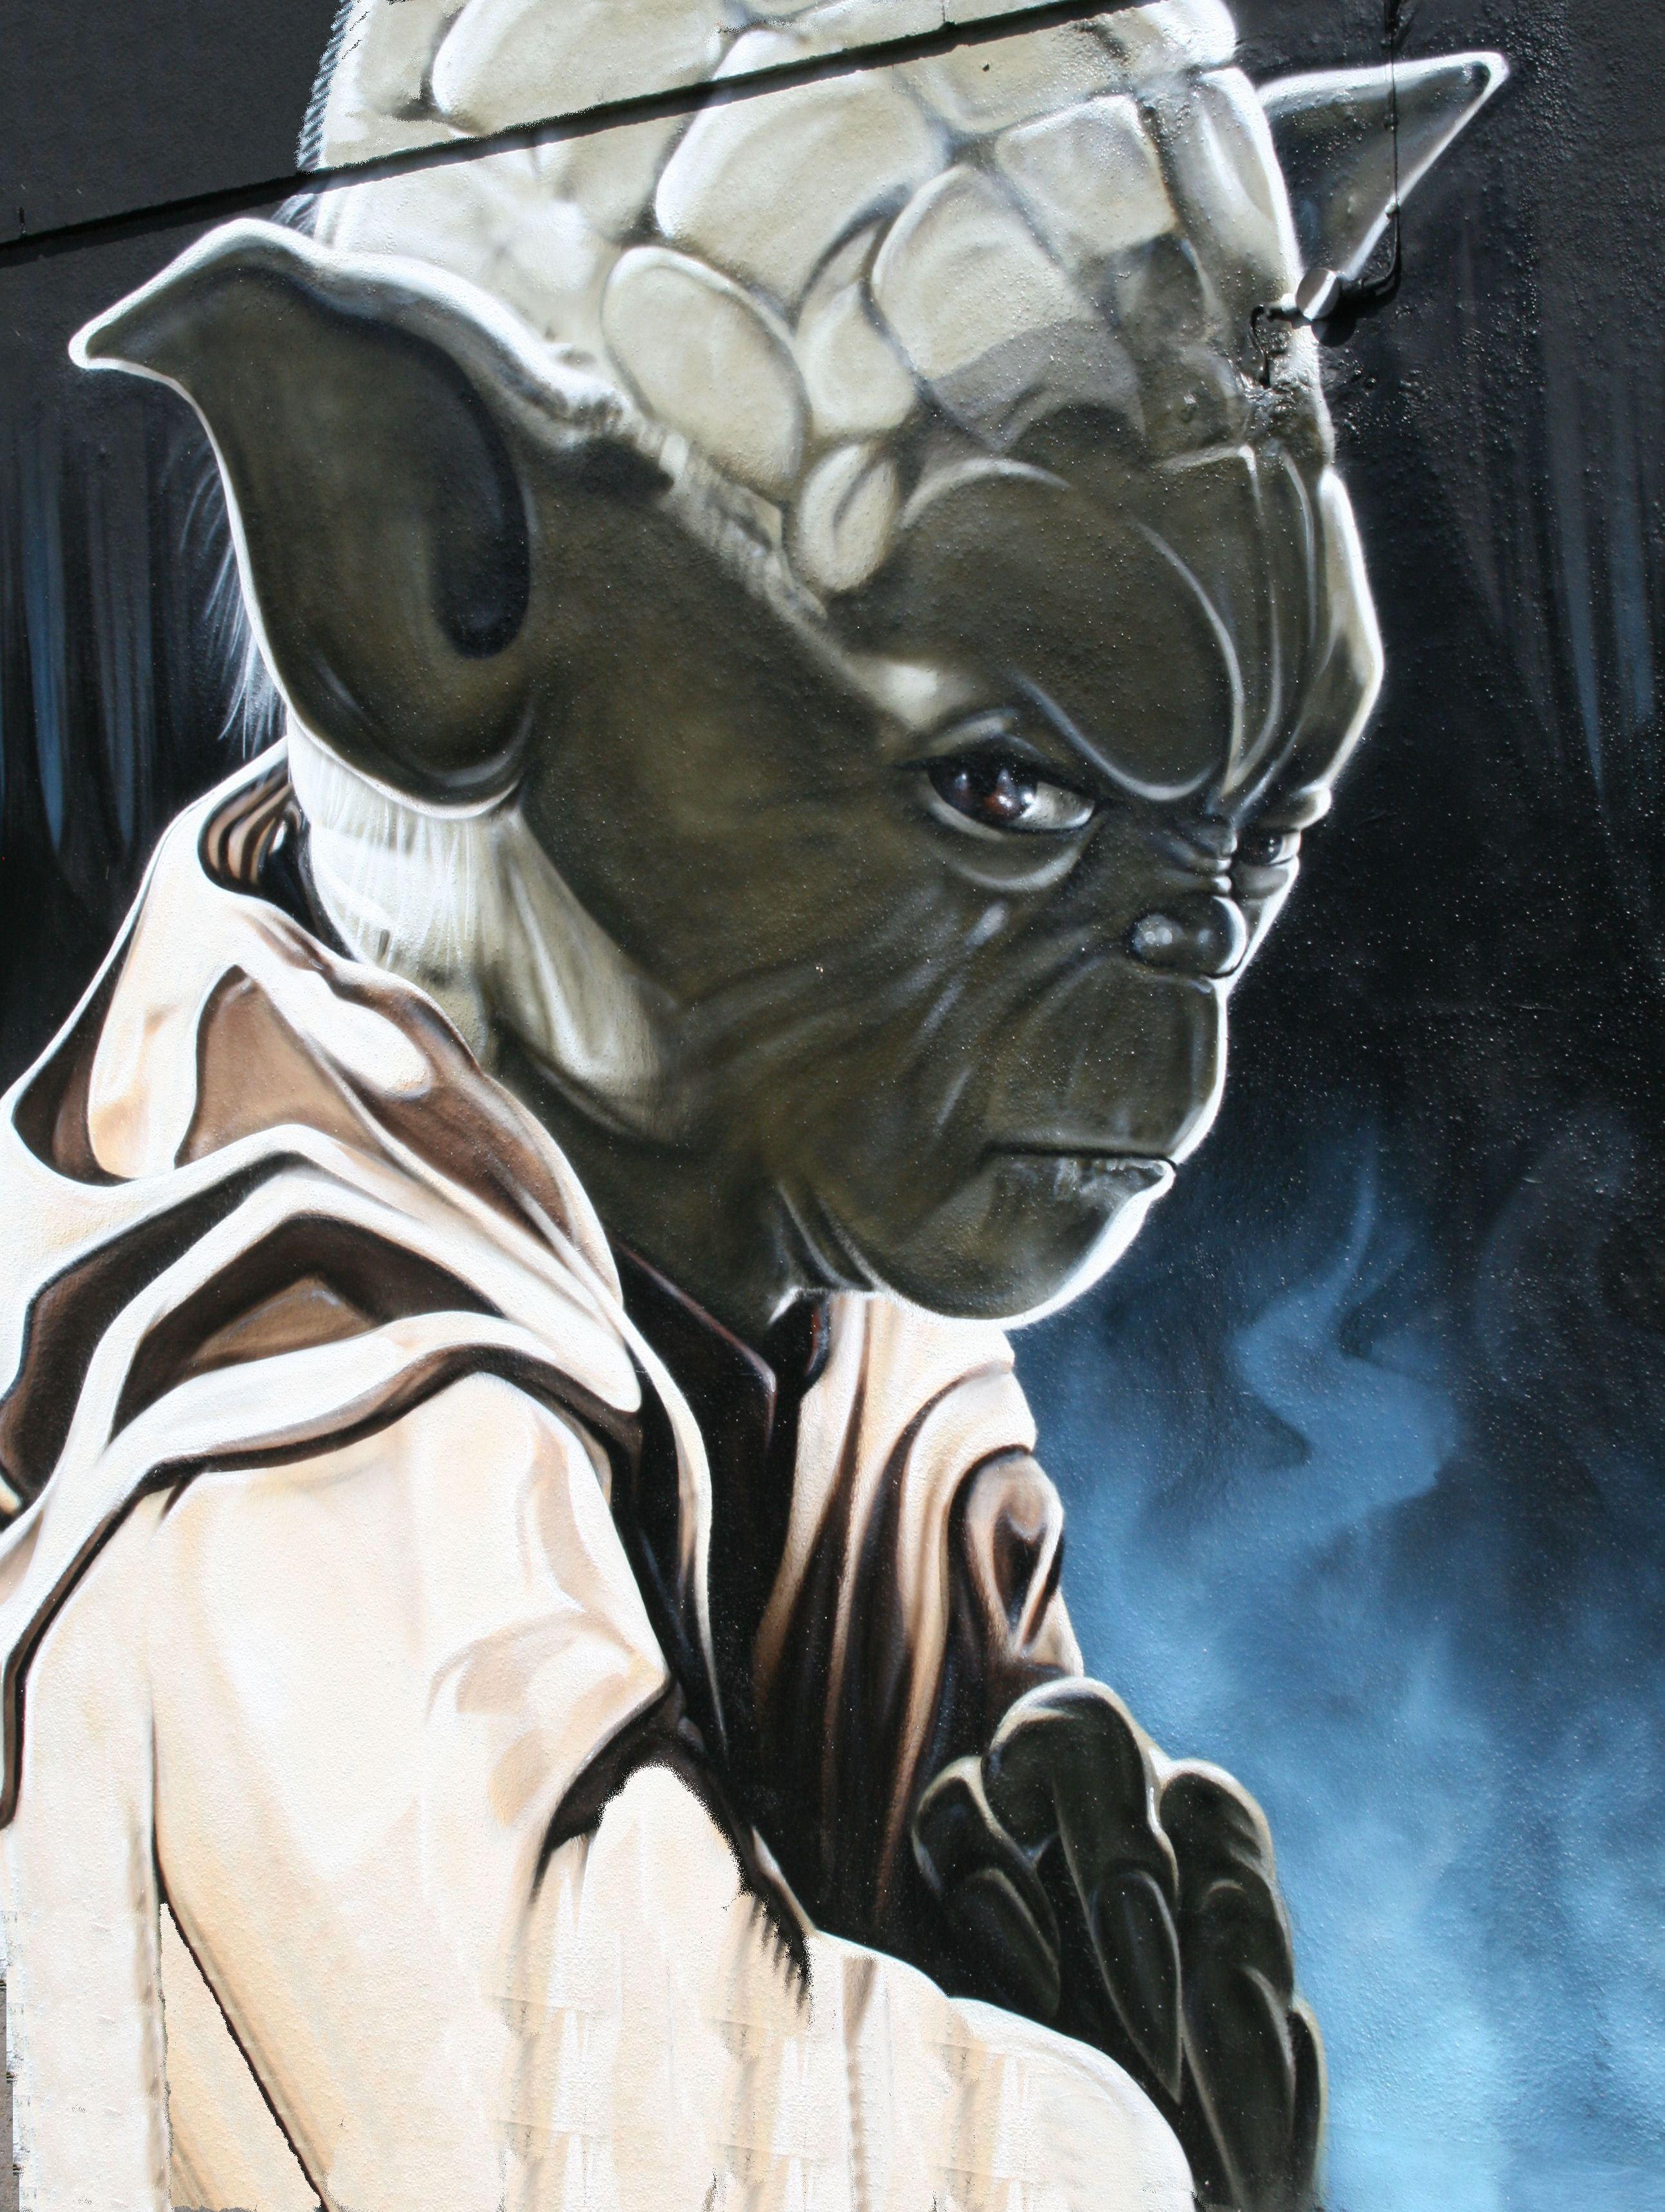 Yoda on a Wall